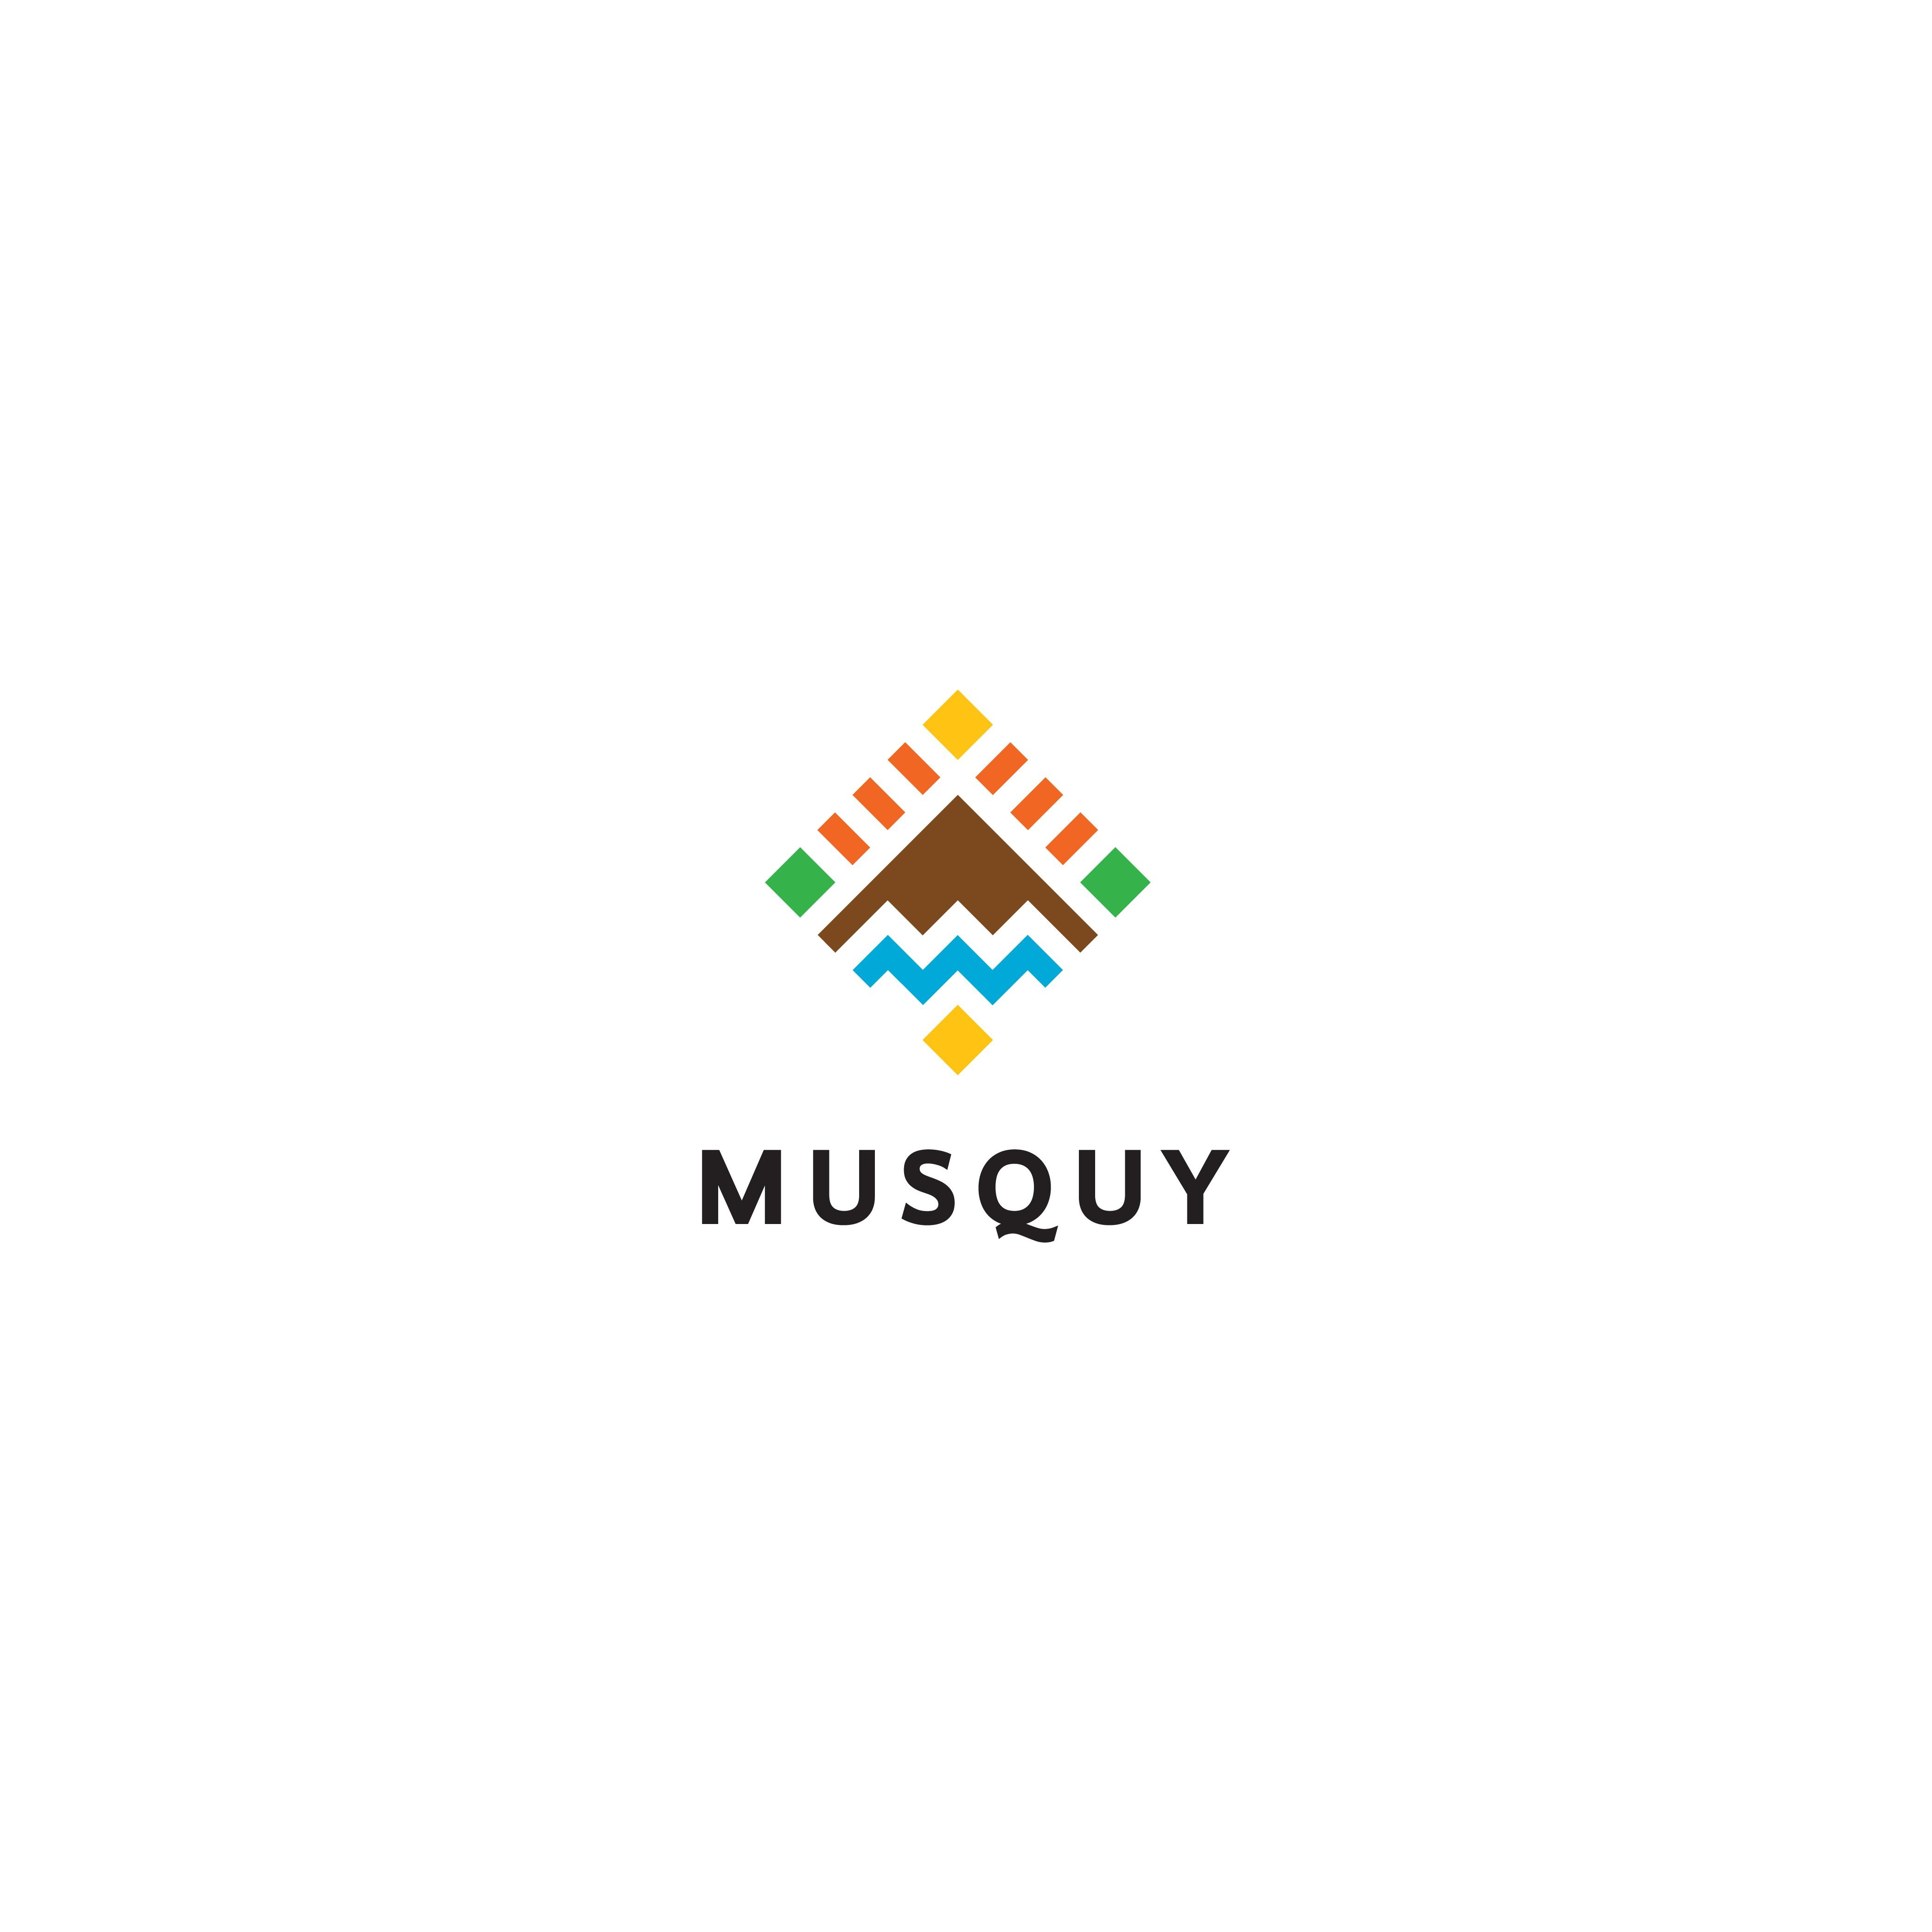 MUSQUY